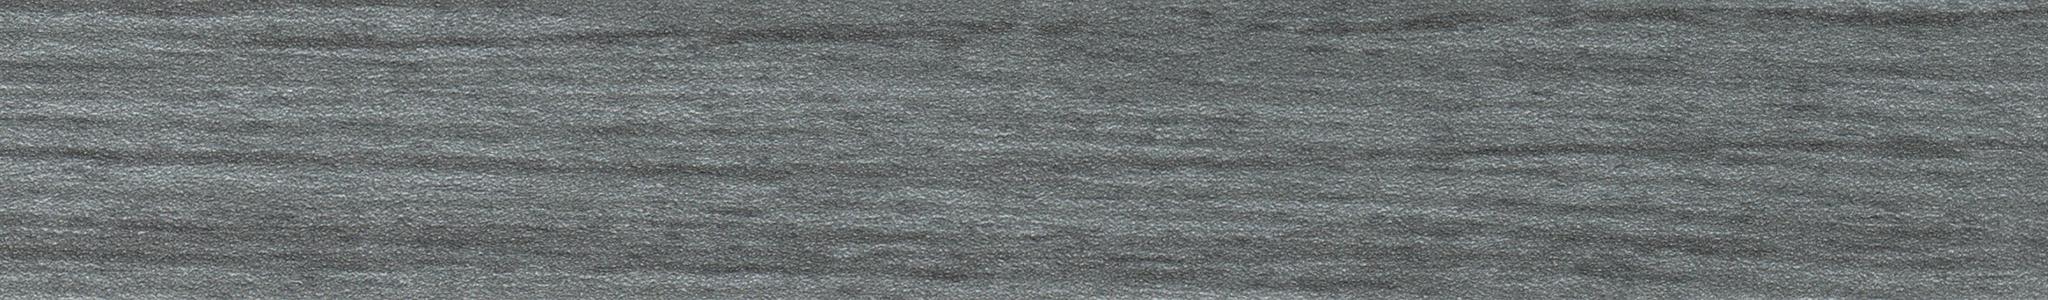 HD 291107 ABS hrana metallic wood perla